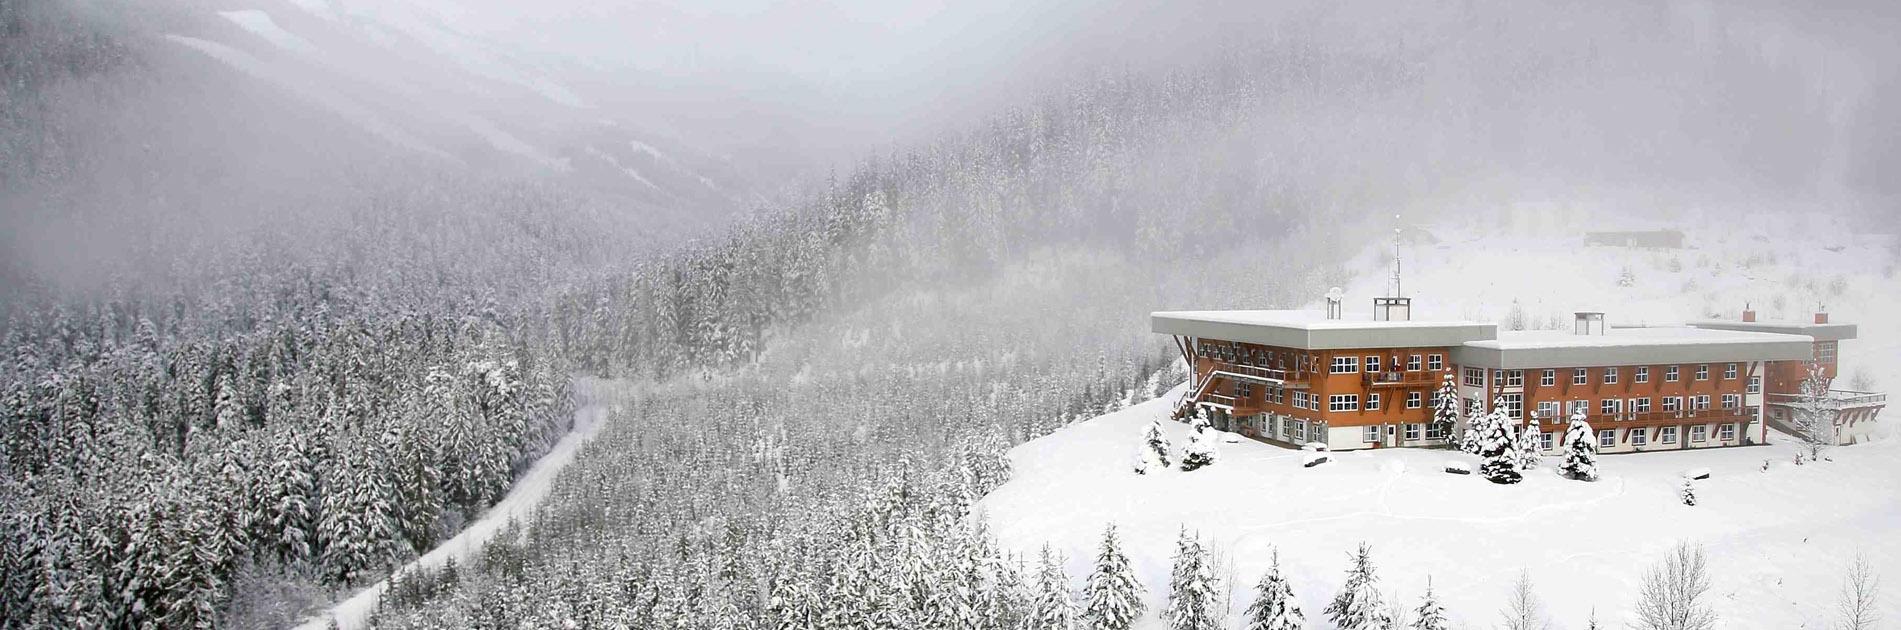 British Columbia: La mejor nieve polvo del mundo